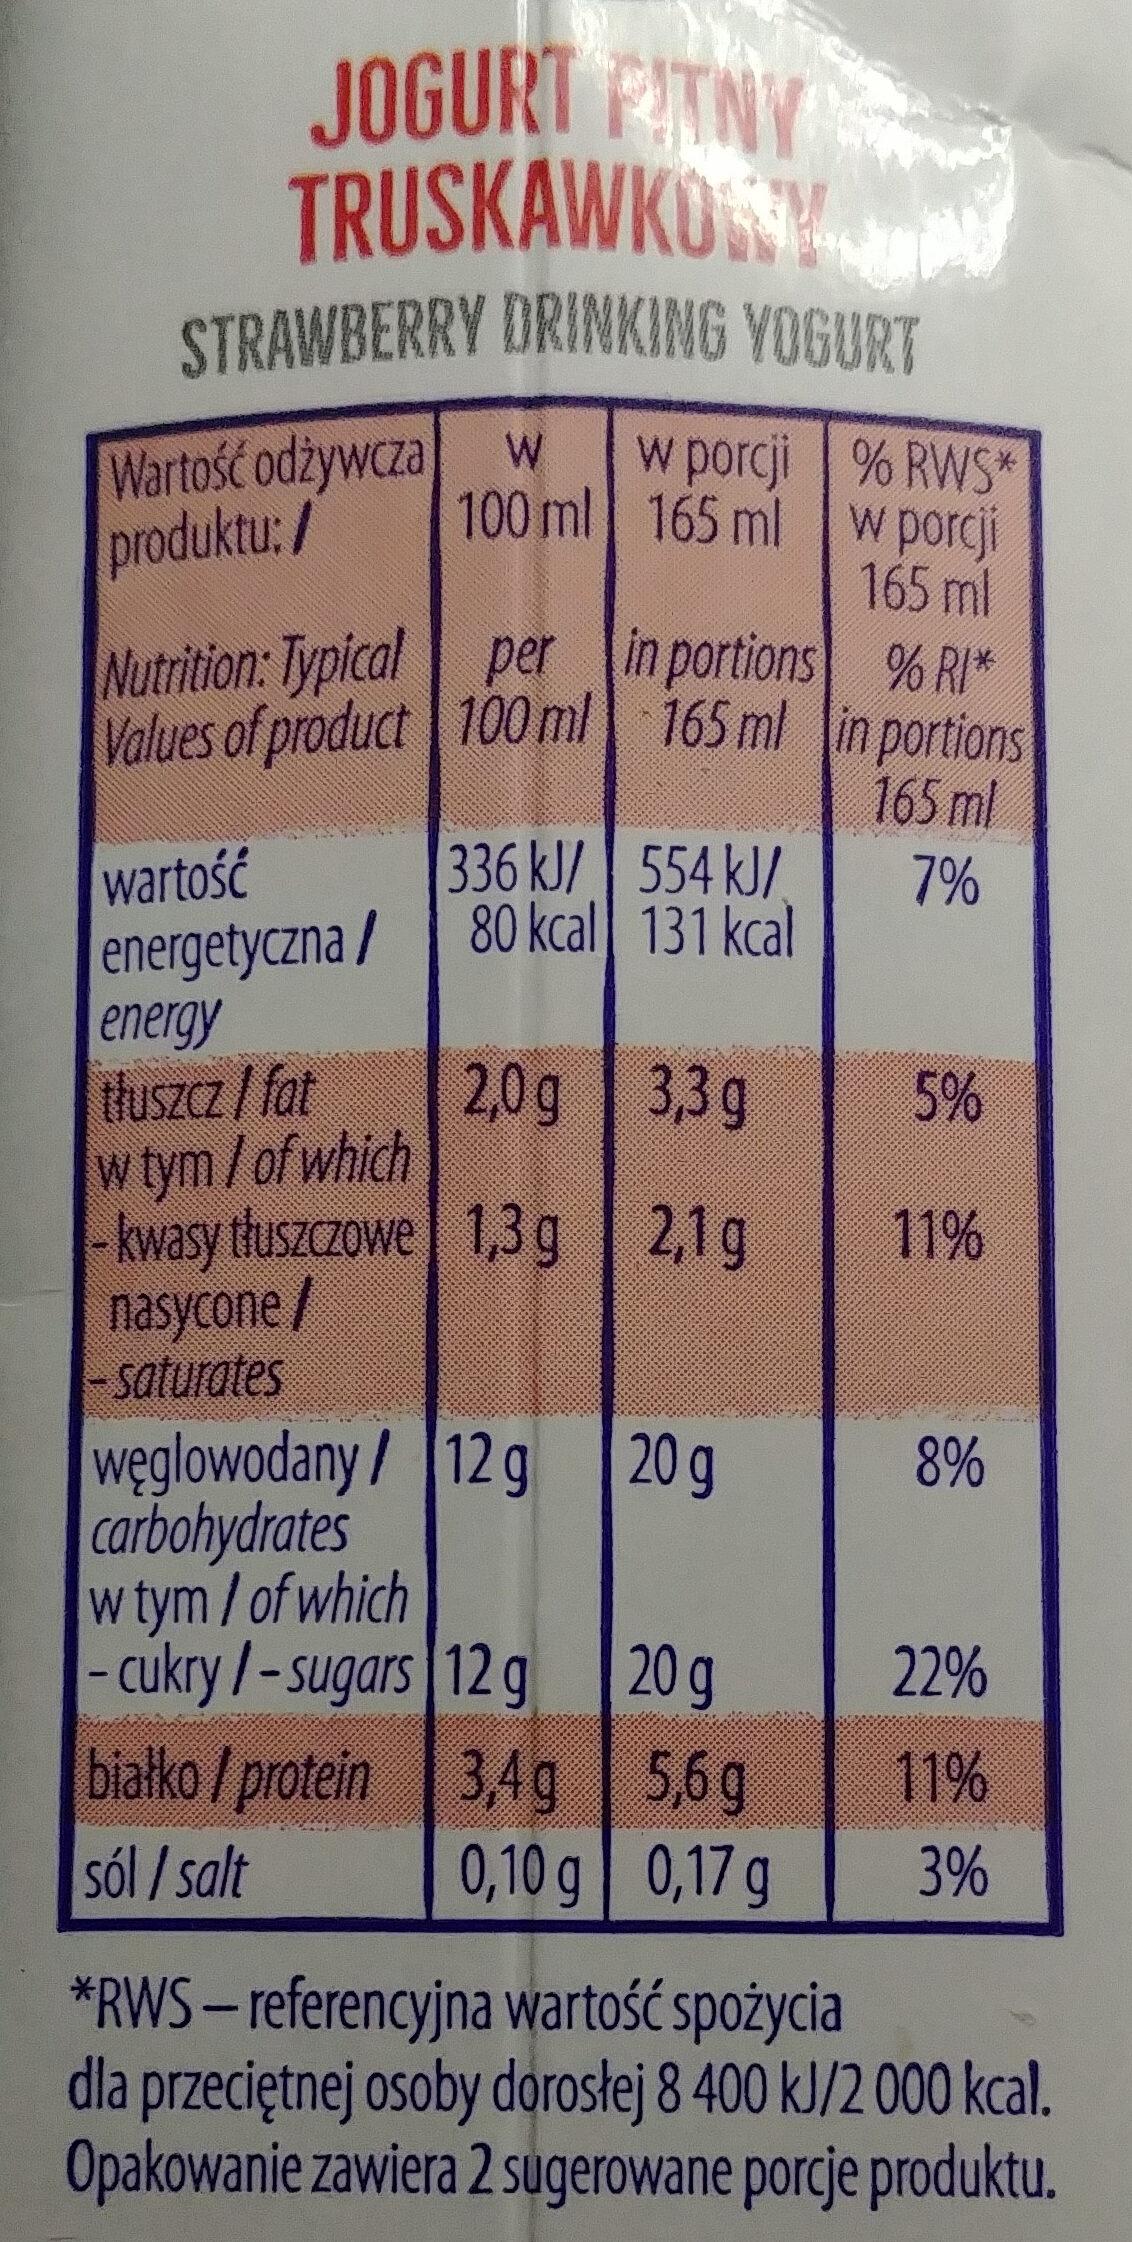 Jogurt pitny truskawkowy - Nutrition facts - pl